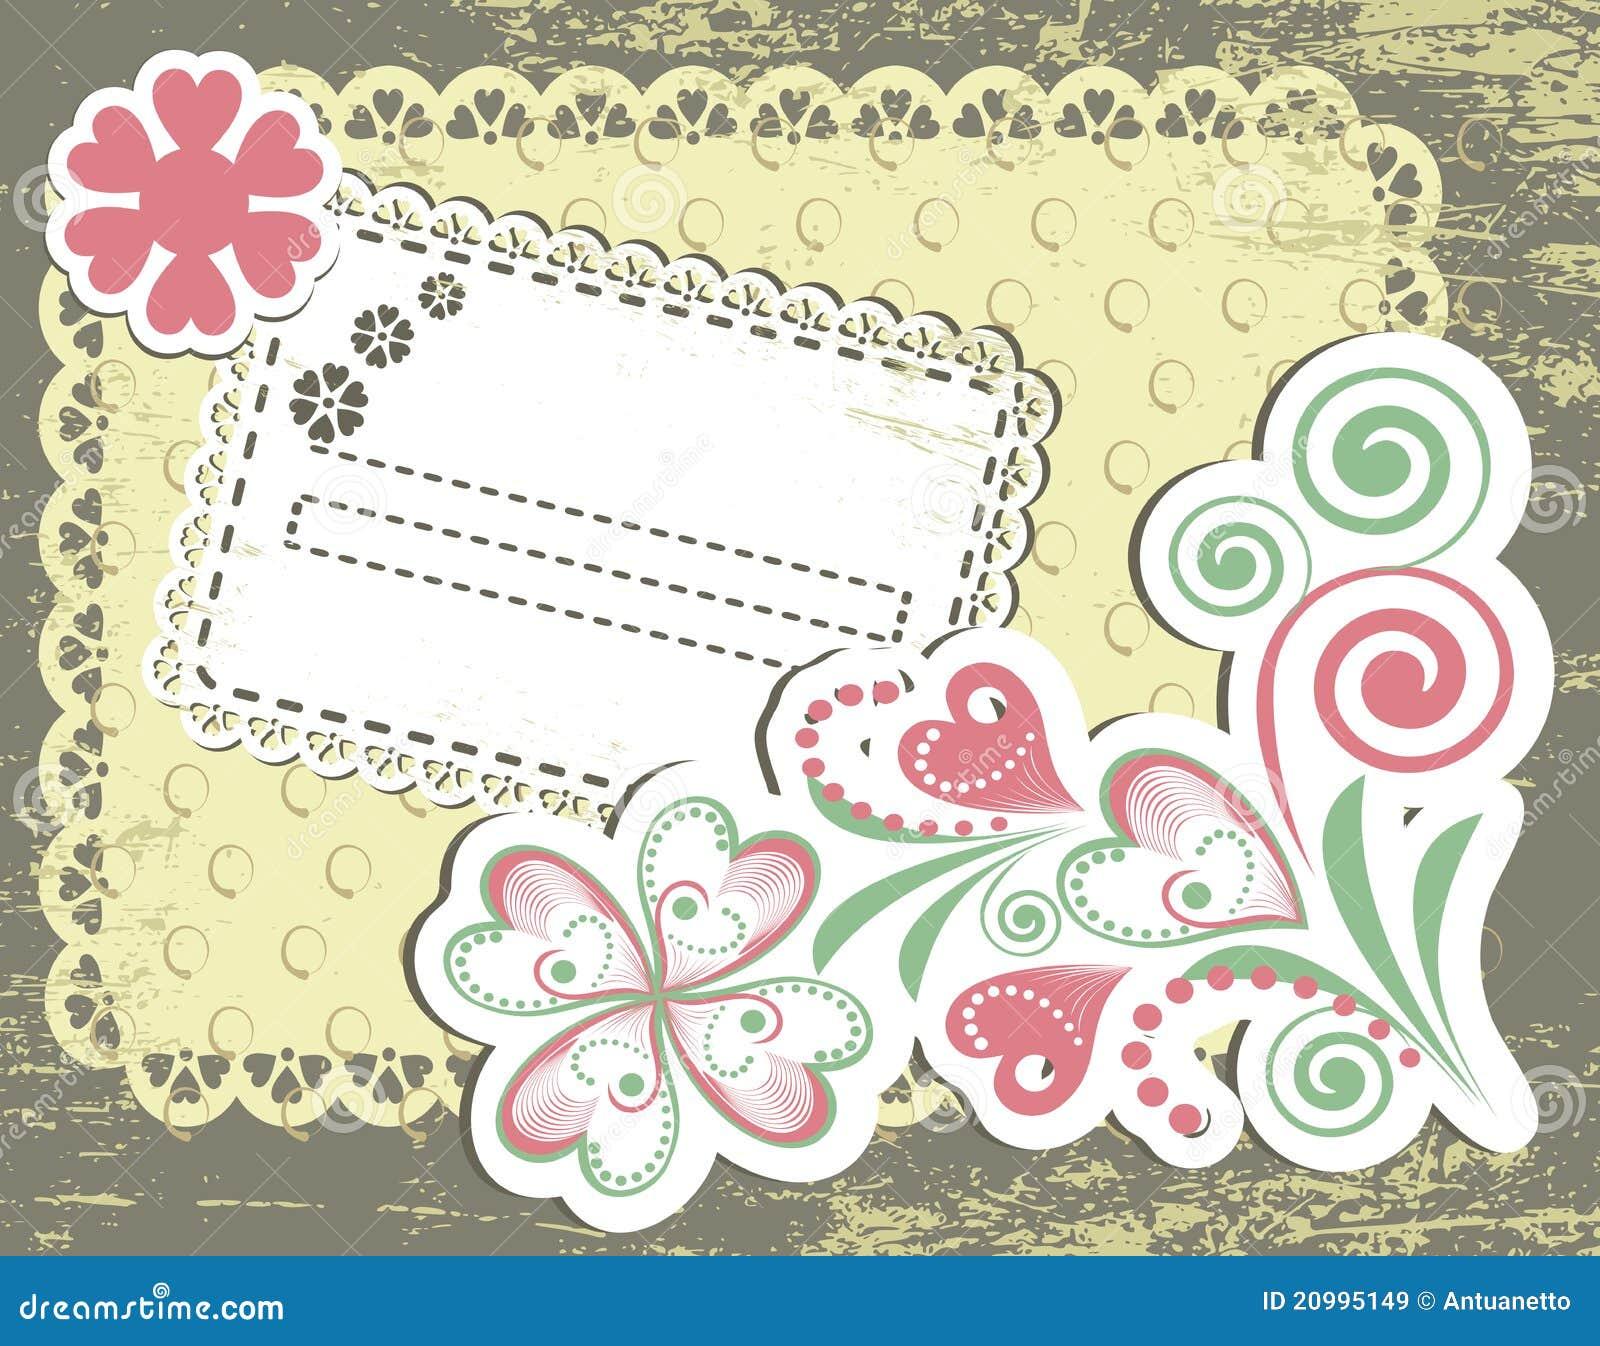 Vintage flower frame design for greeting card stock vector vintage flower frame design for greeting card kristyandbryce Choice Image